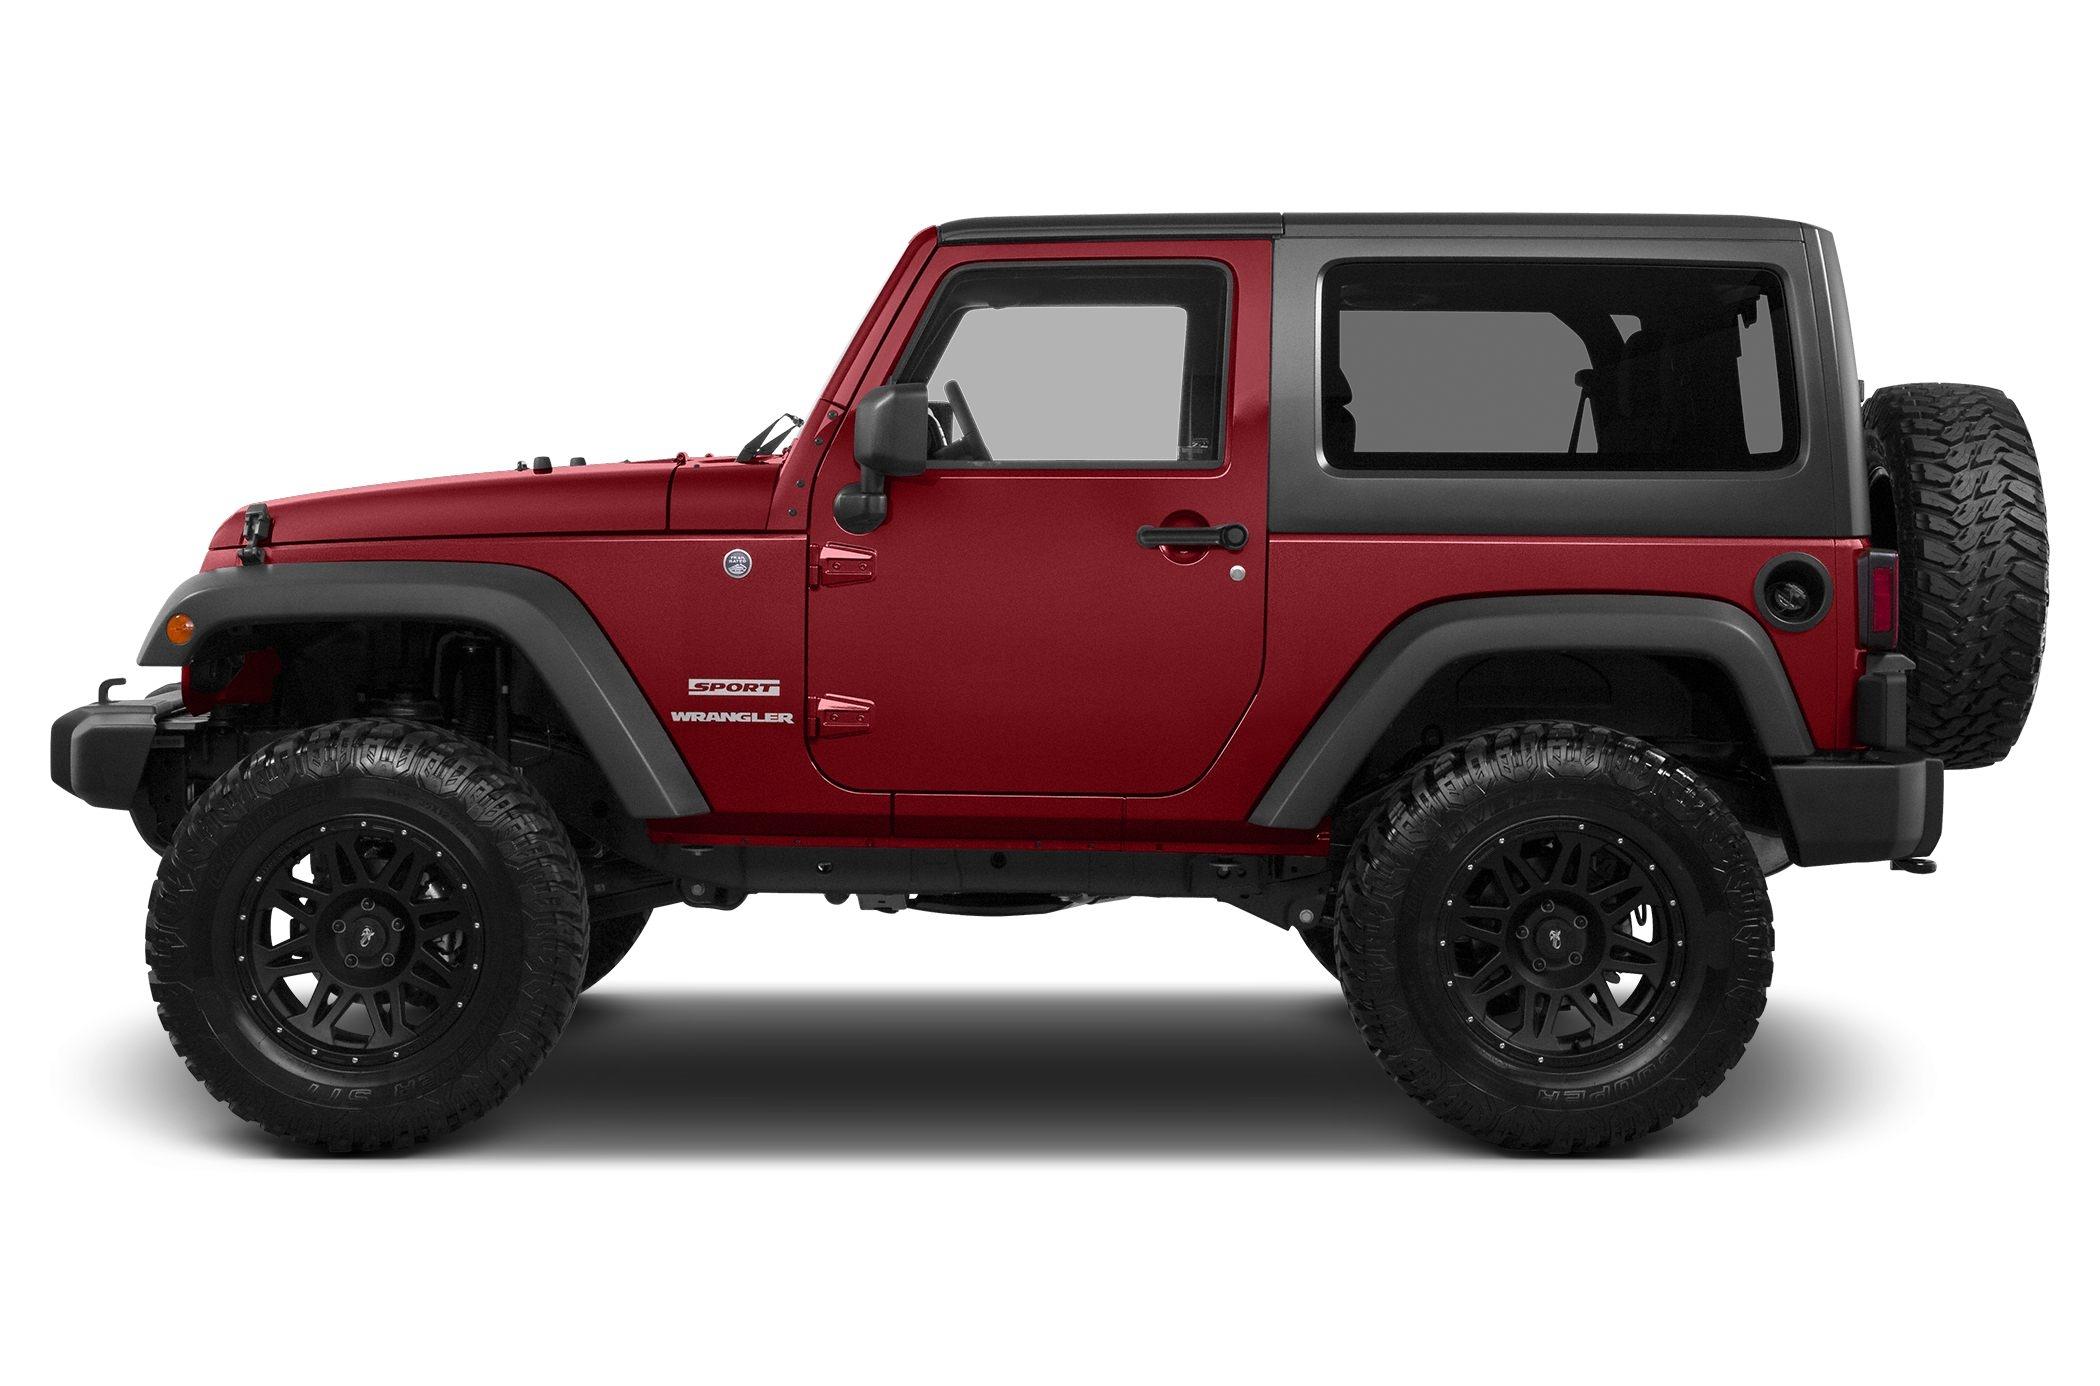 Jeep Wrangler Invoice Price 2014